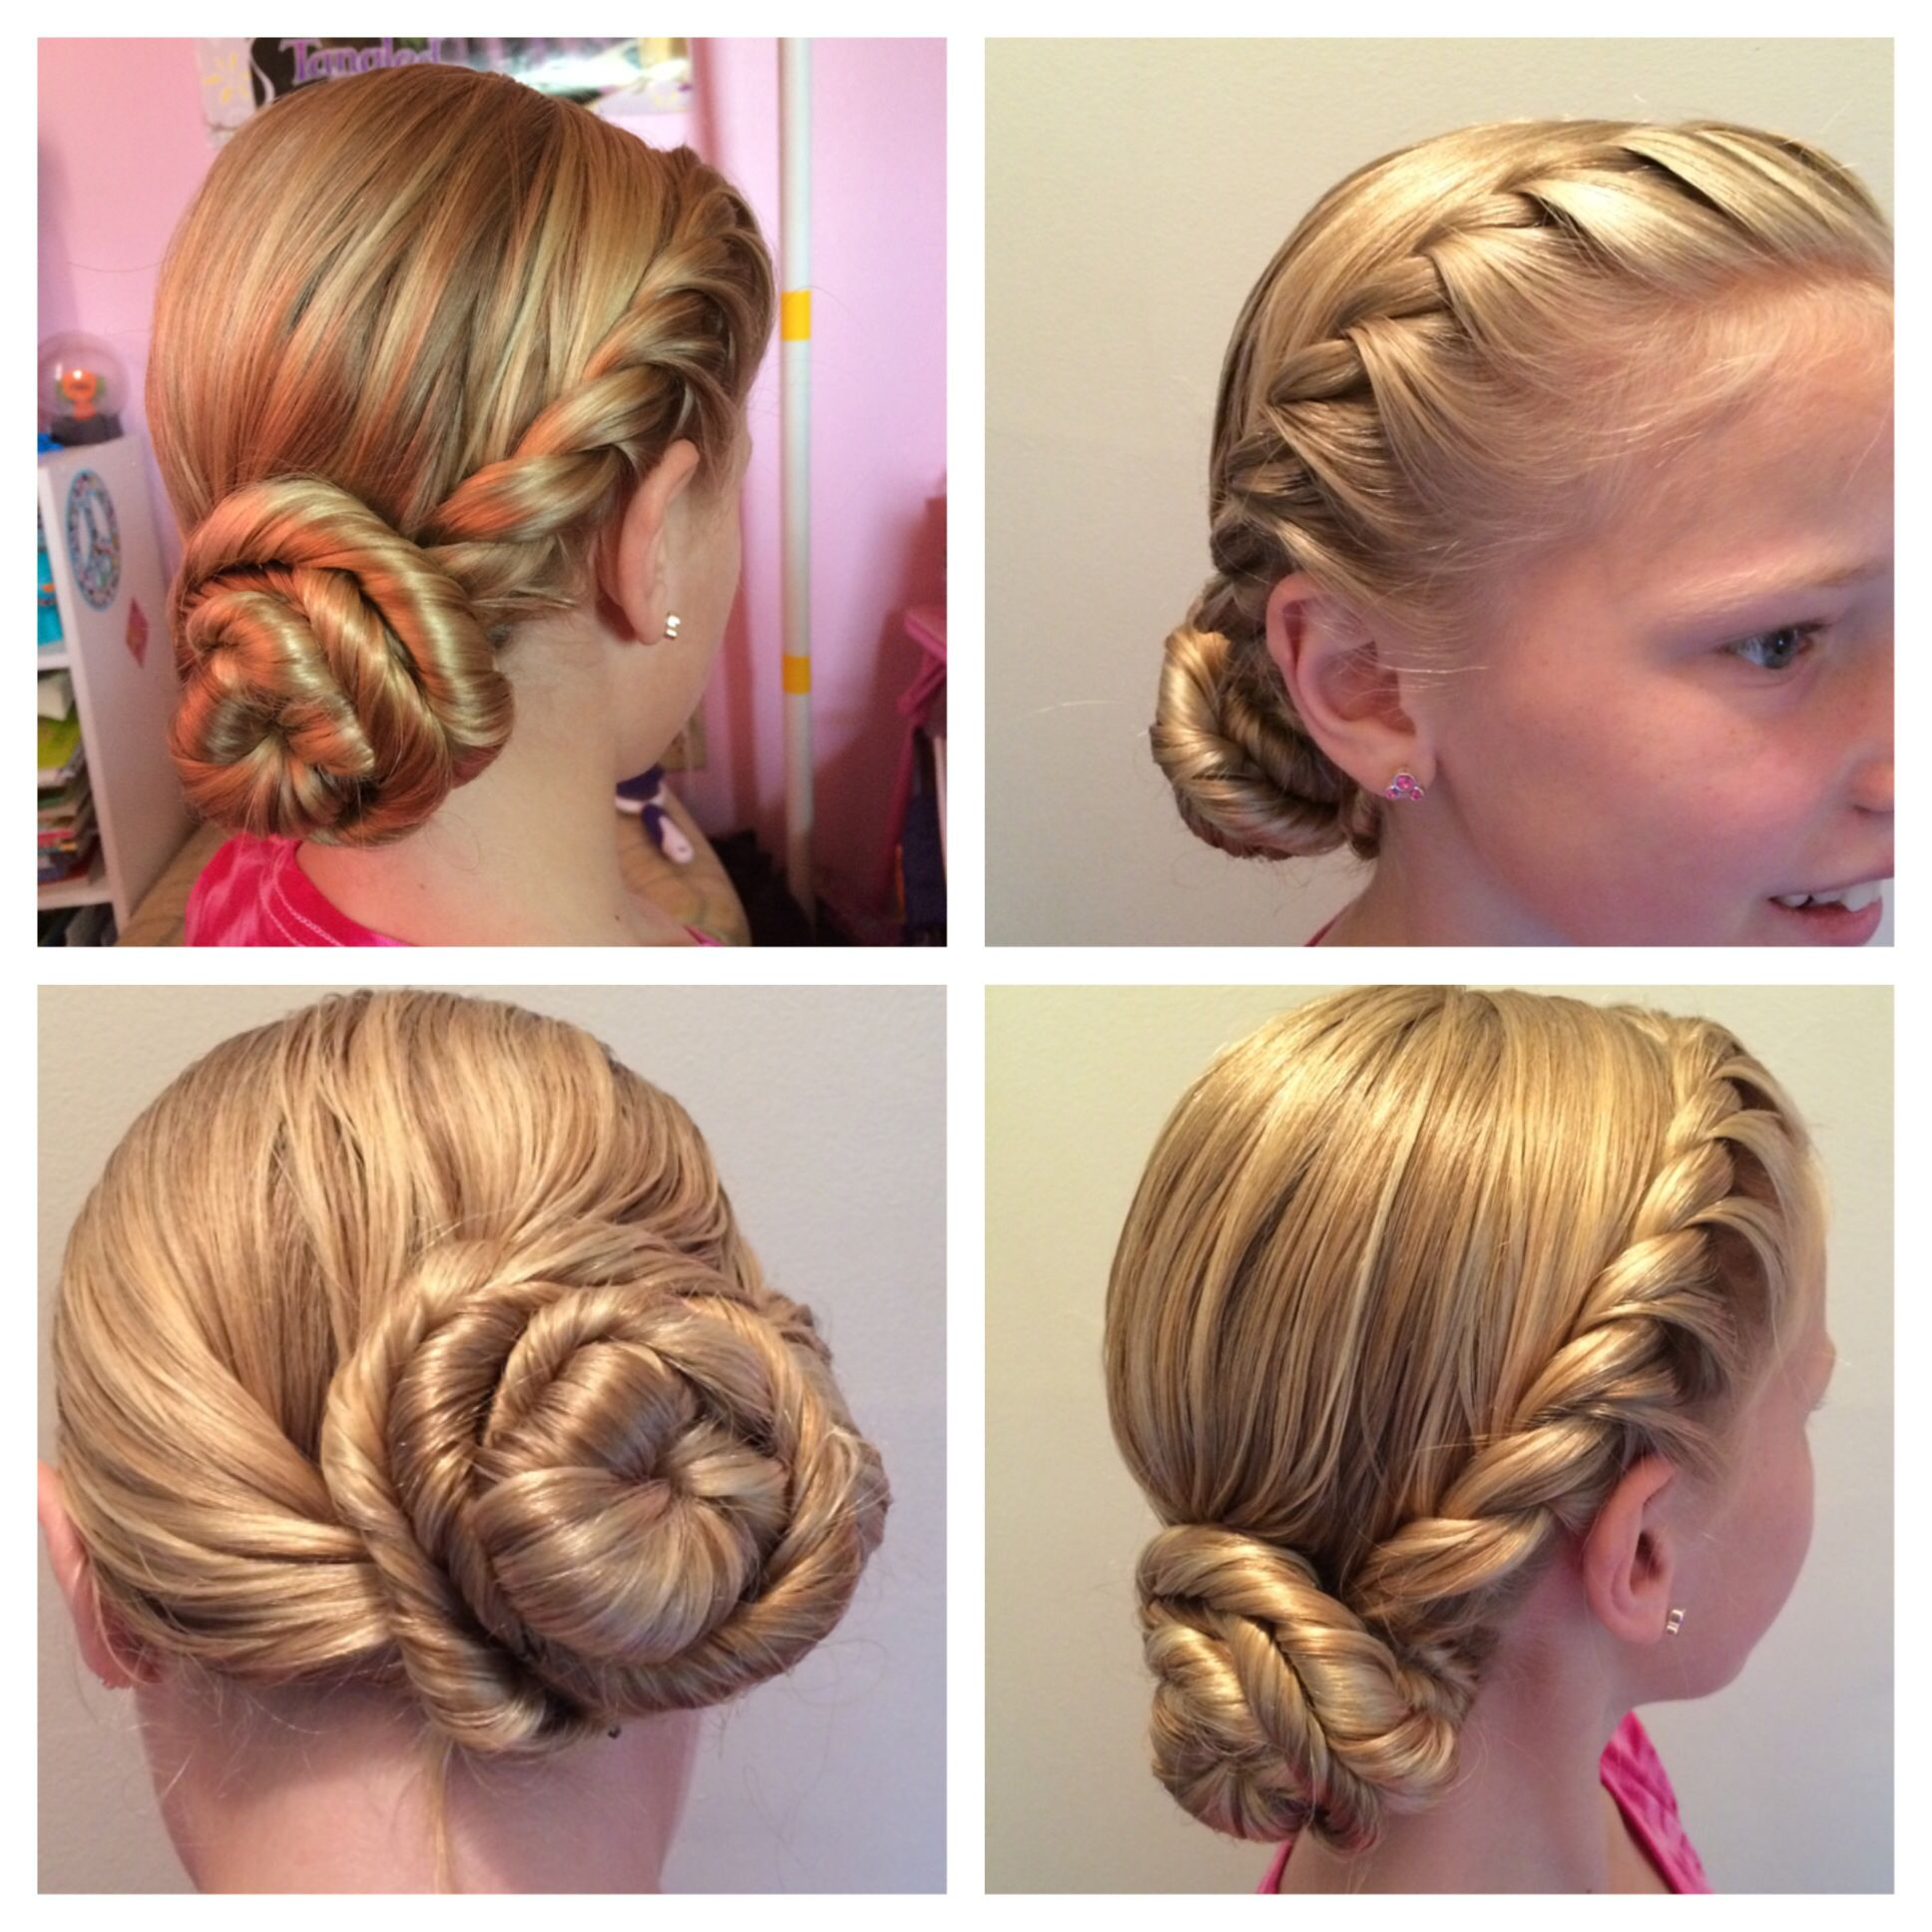 elsa's coronation hairstyle